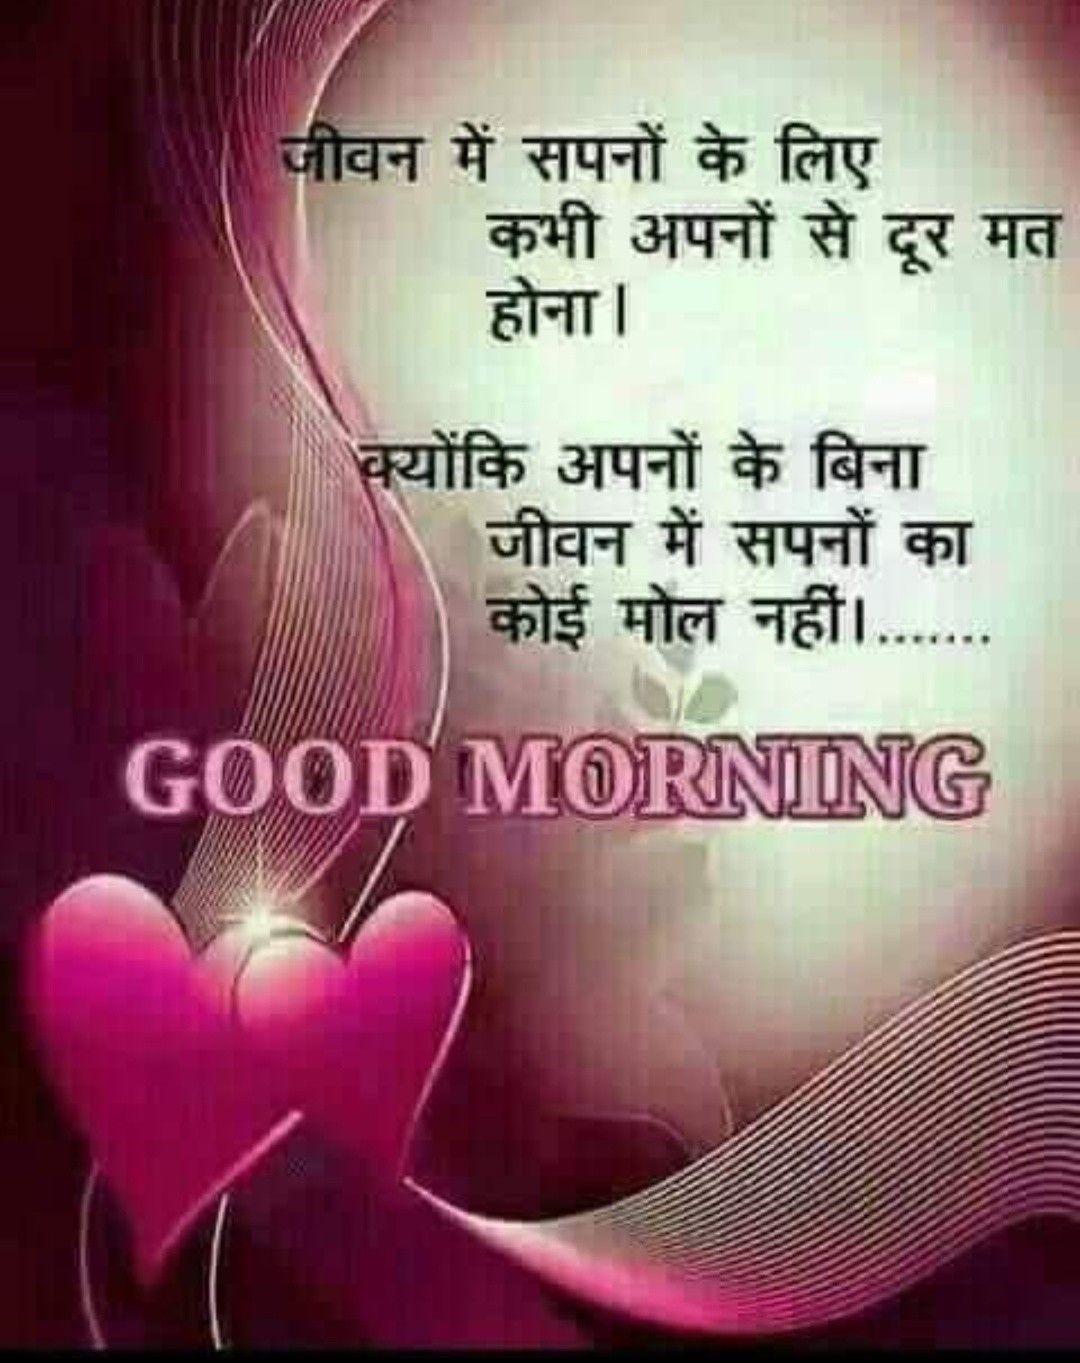 Pin By Dinesh Kumar Pandey On Su Prabhat Good Morning Text